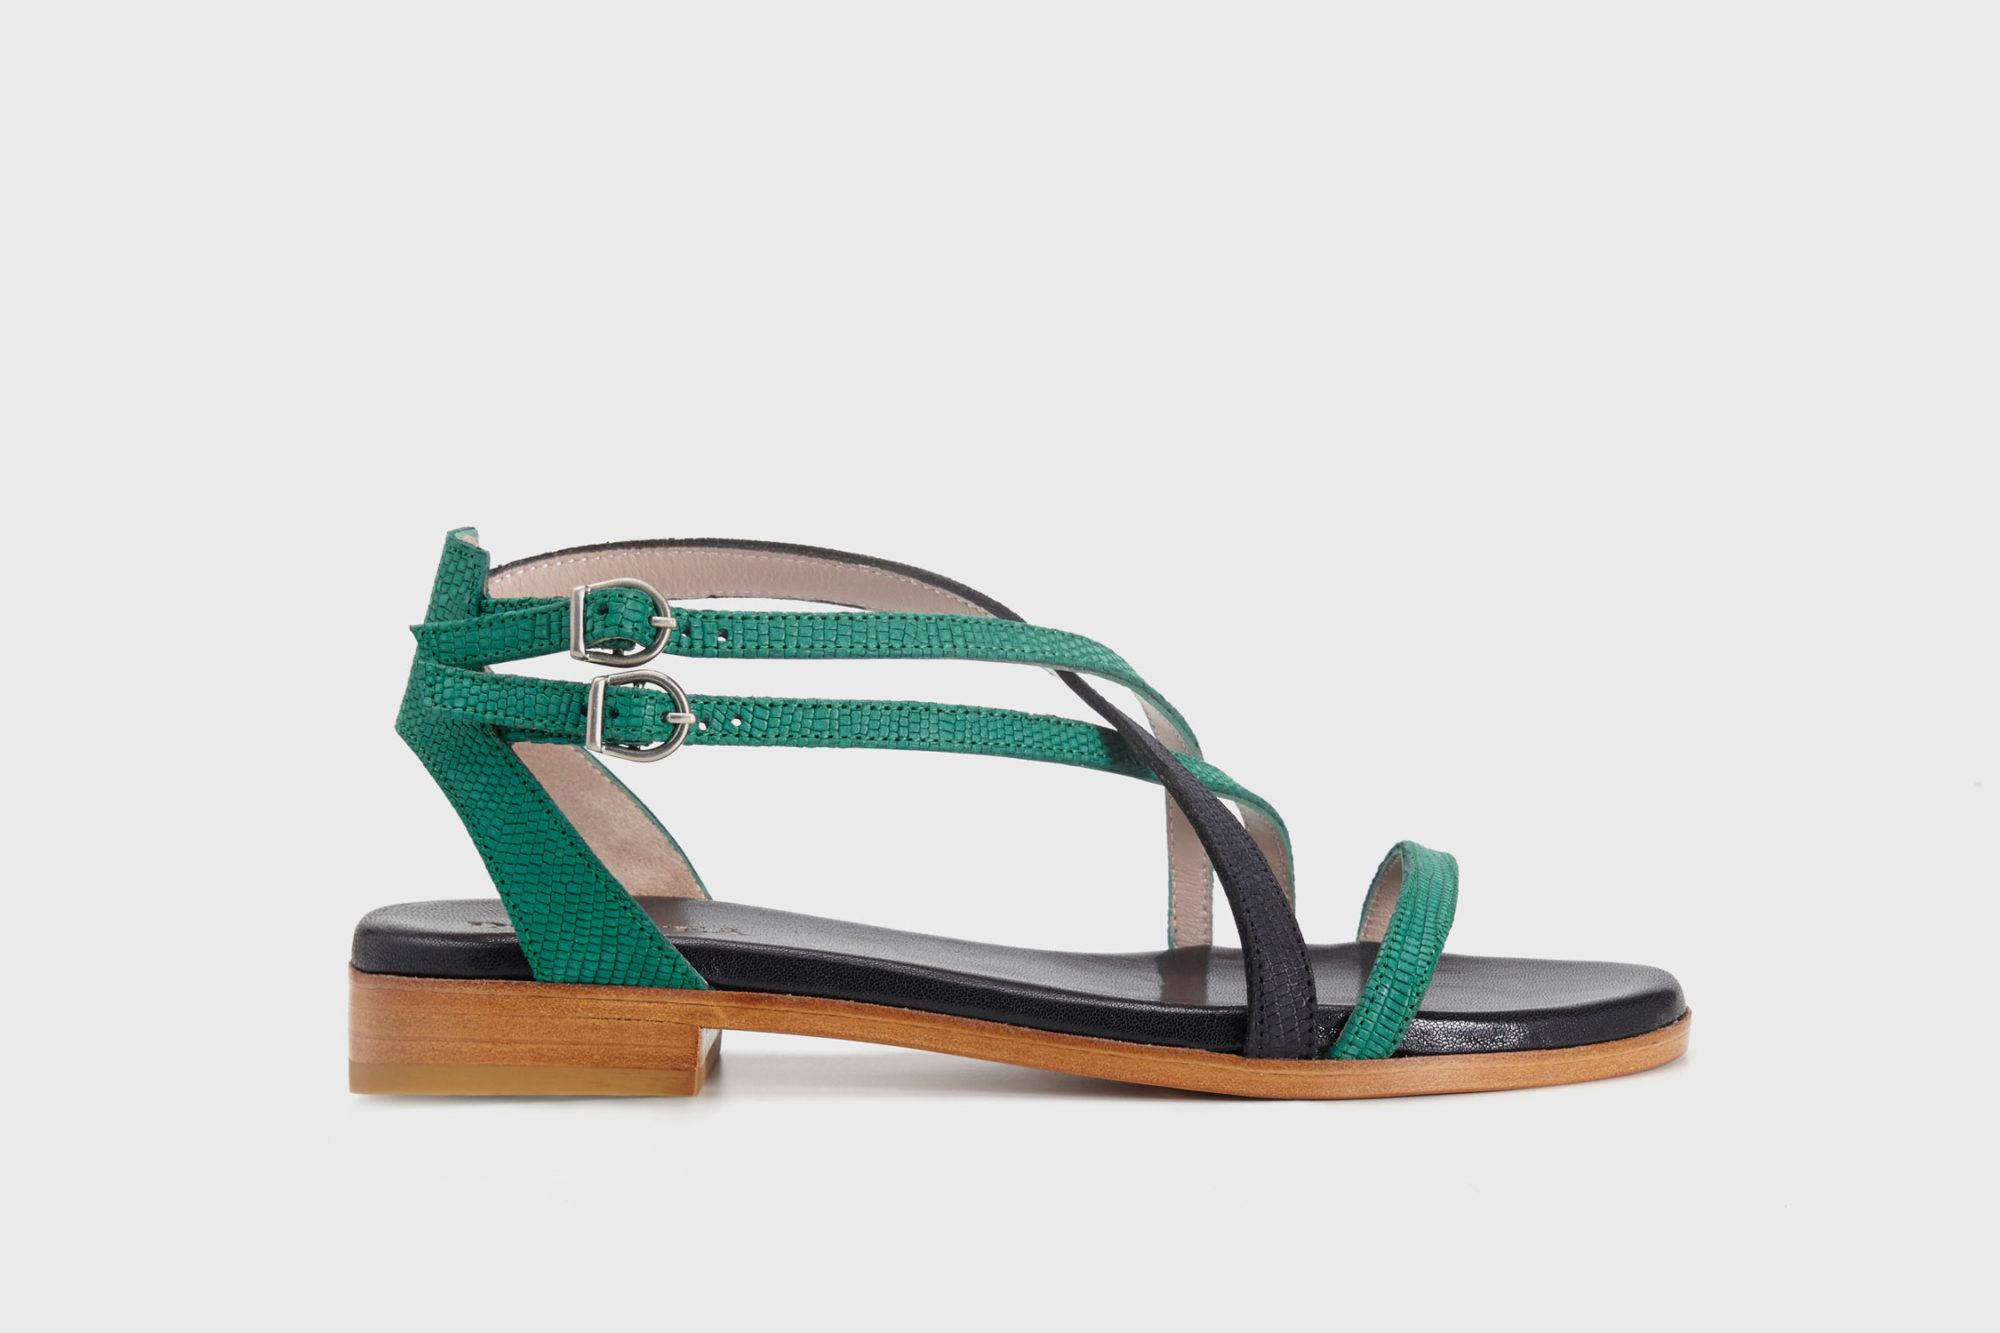 Dorotea sandalia plana Charlotte verde esmeralda ss17 perfil